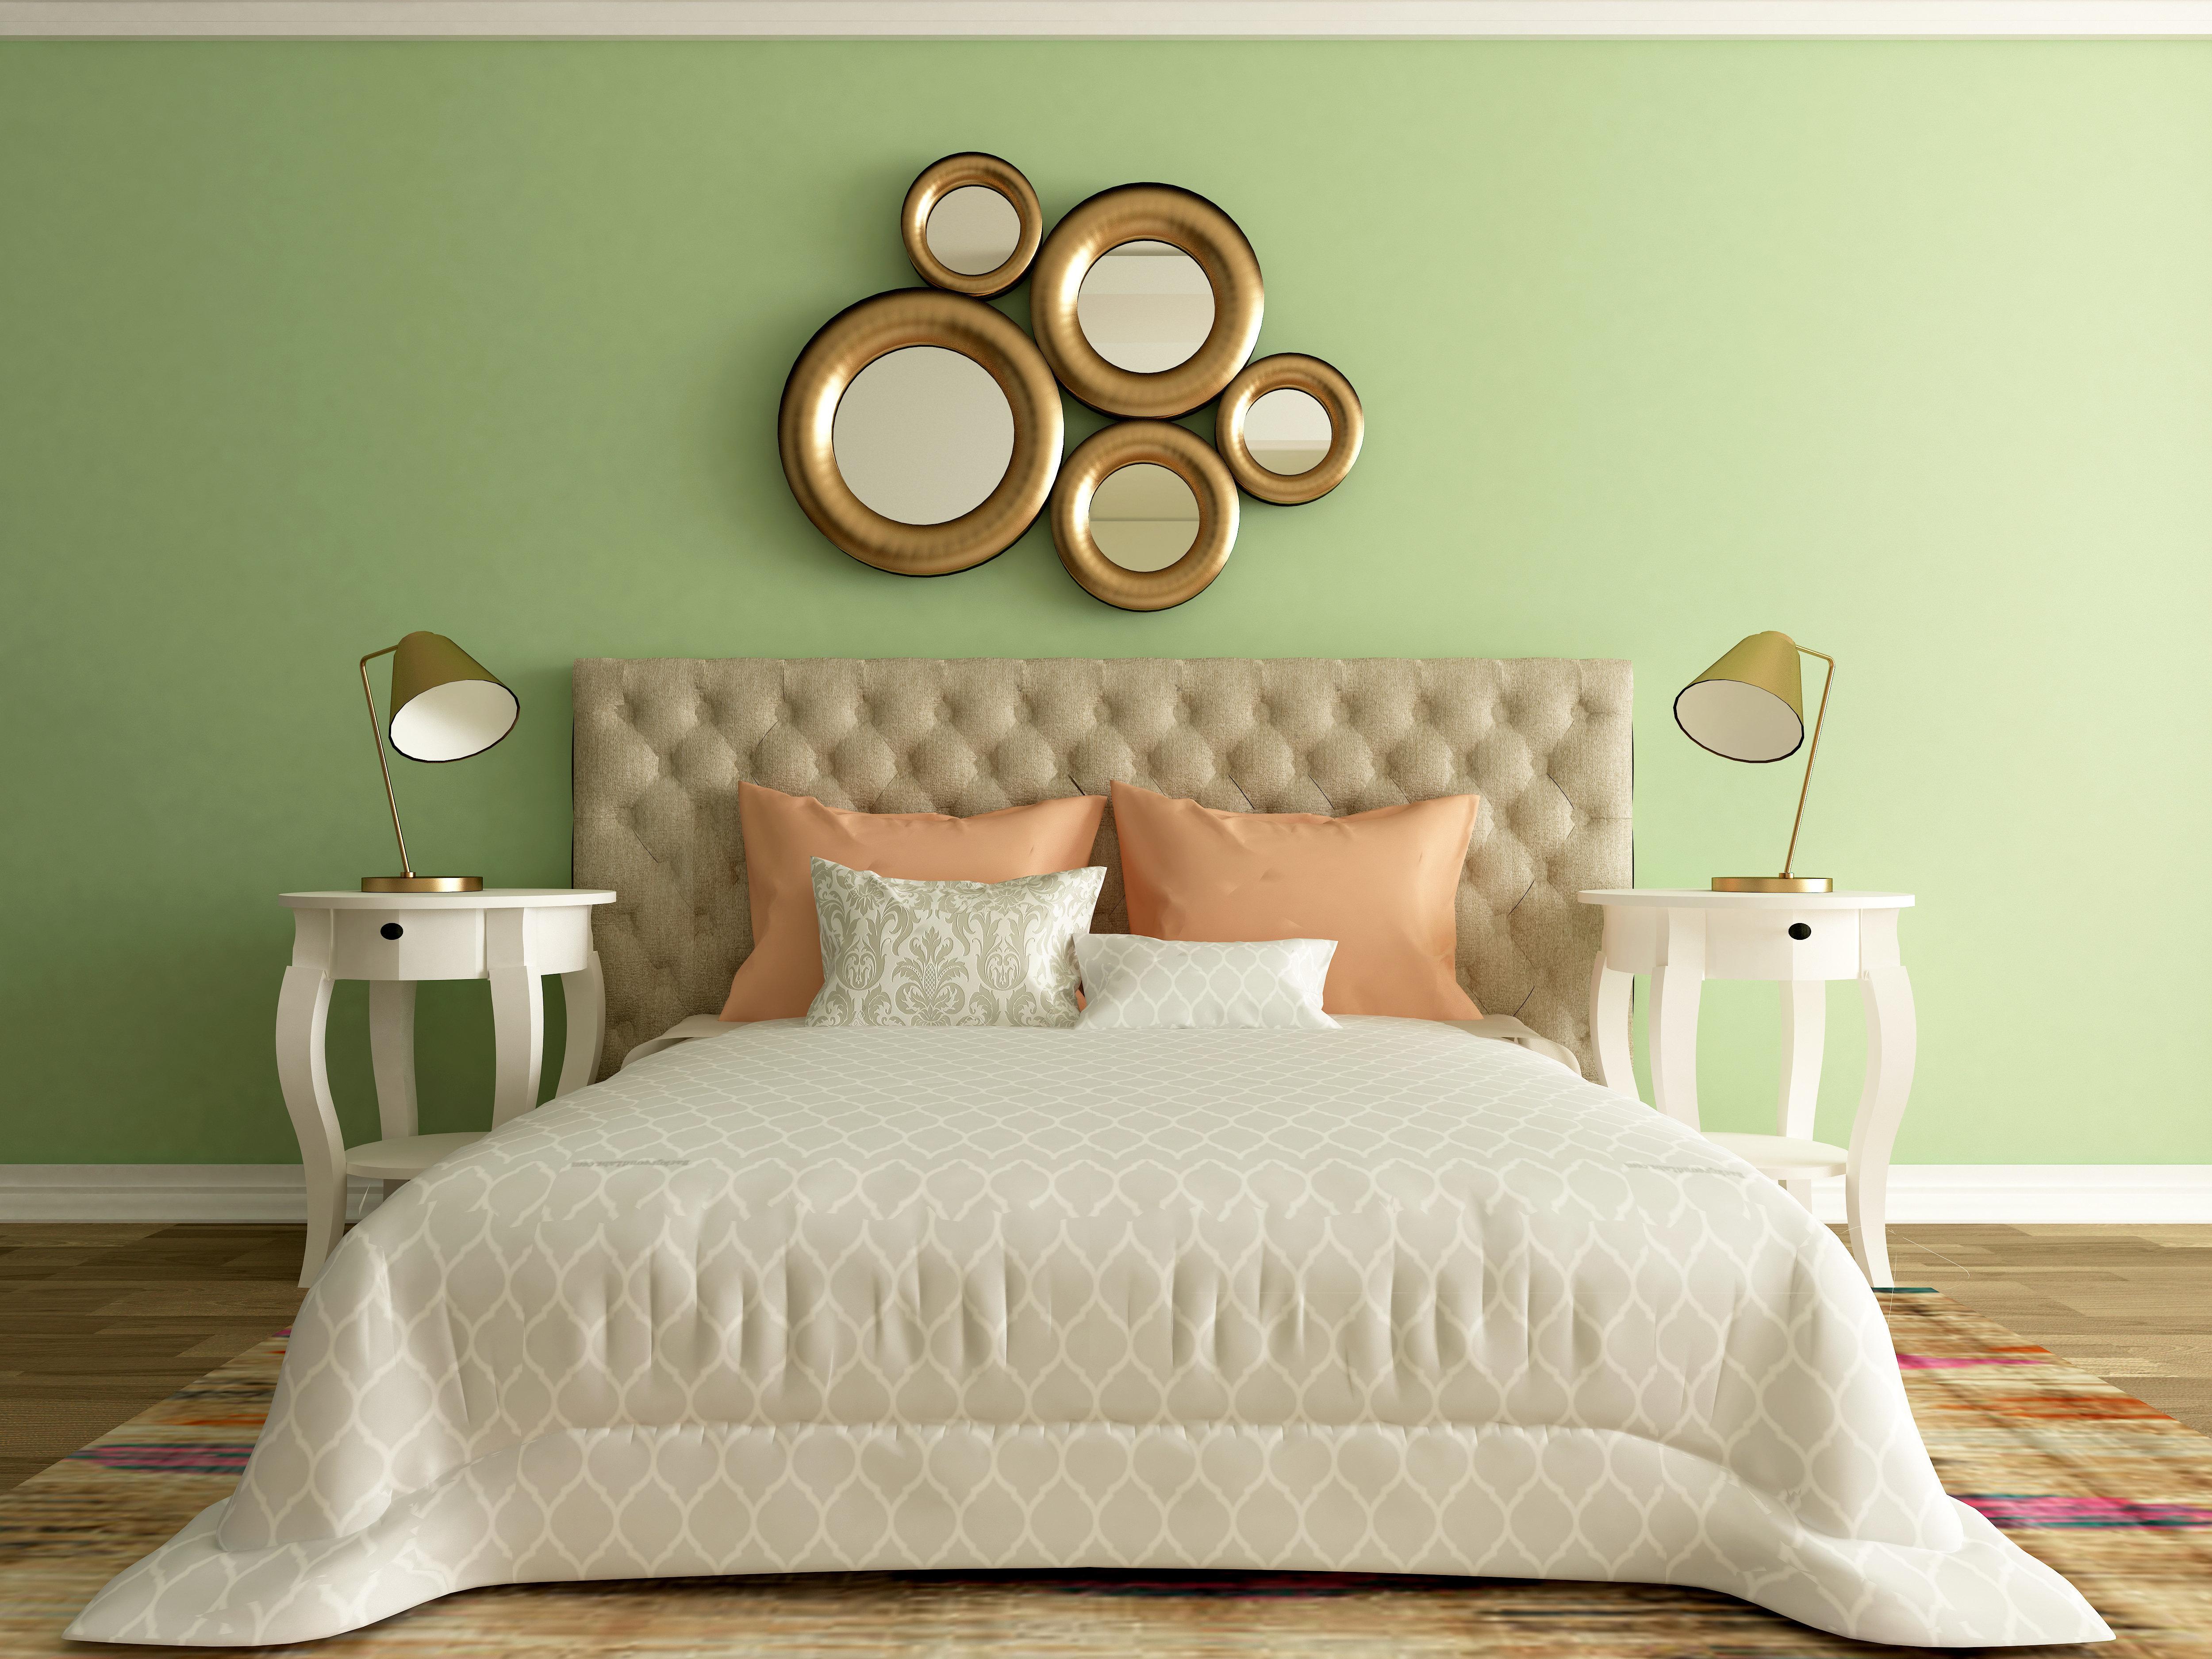 bedroom interior, elegant luxury room, hotel design